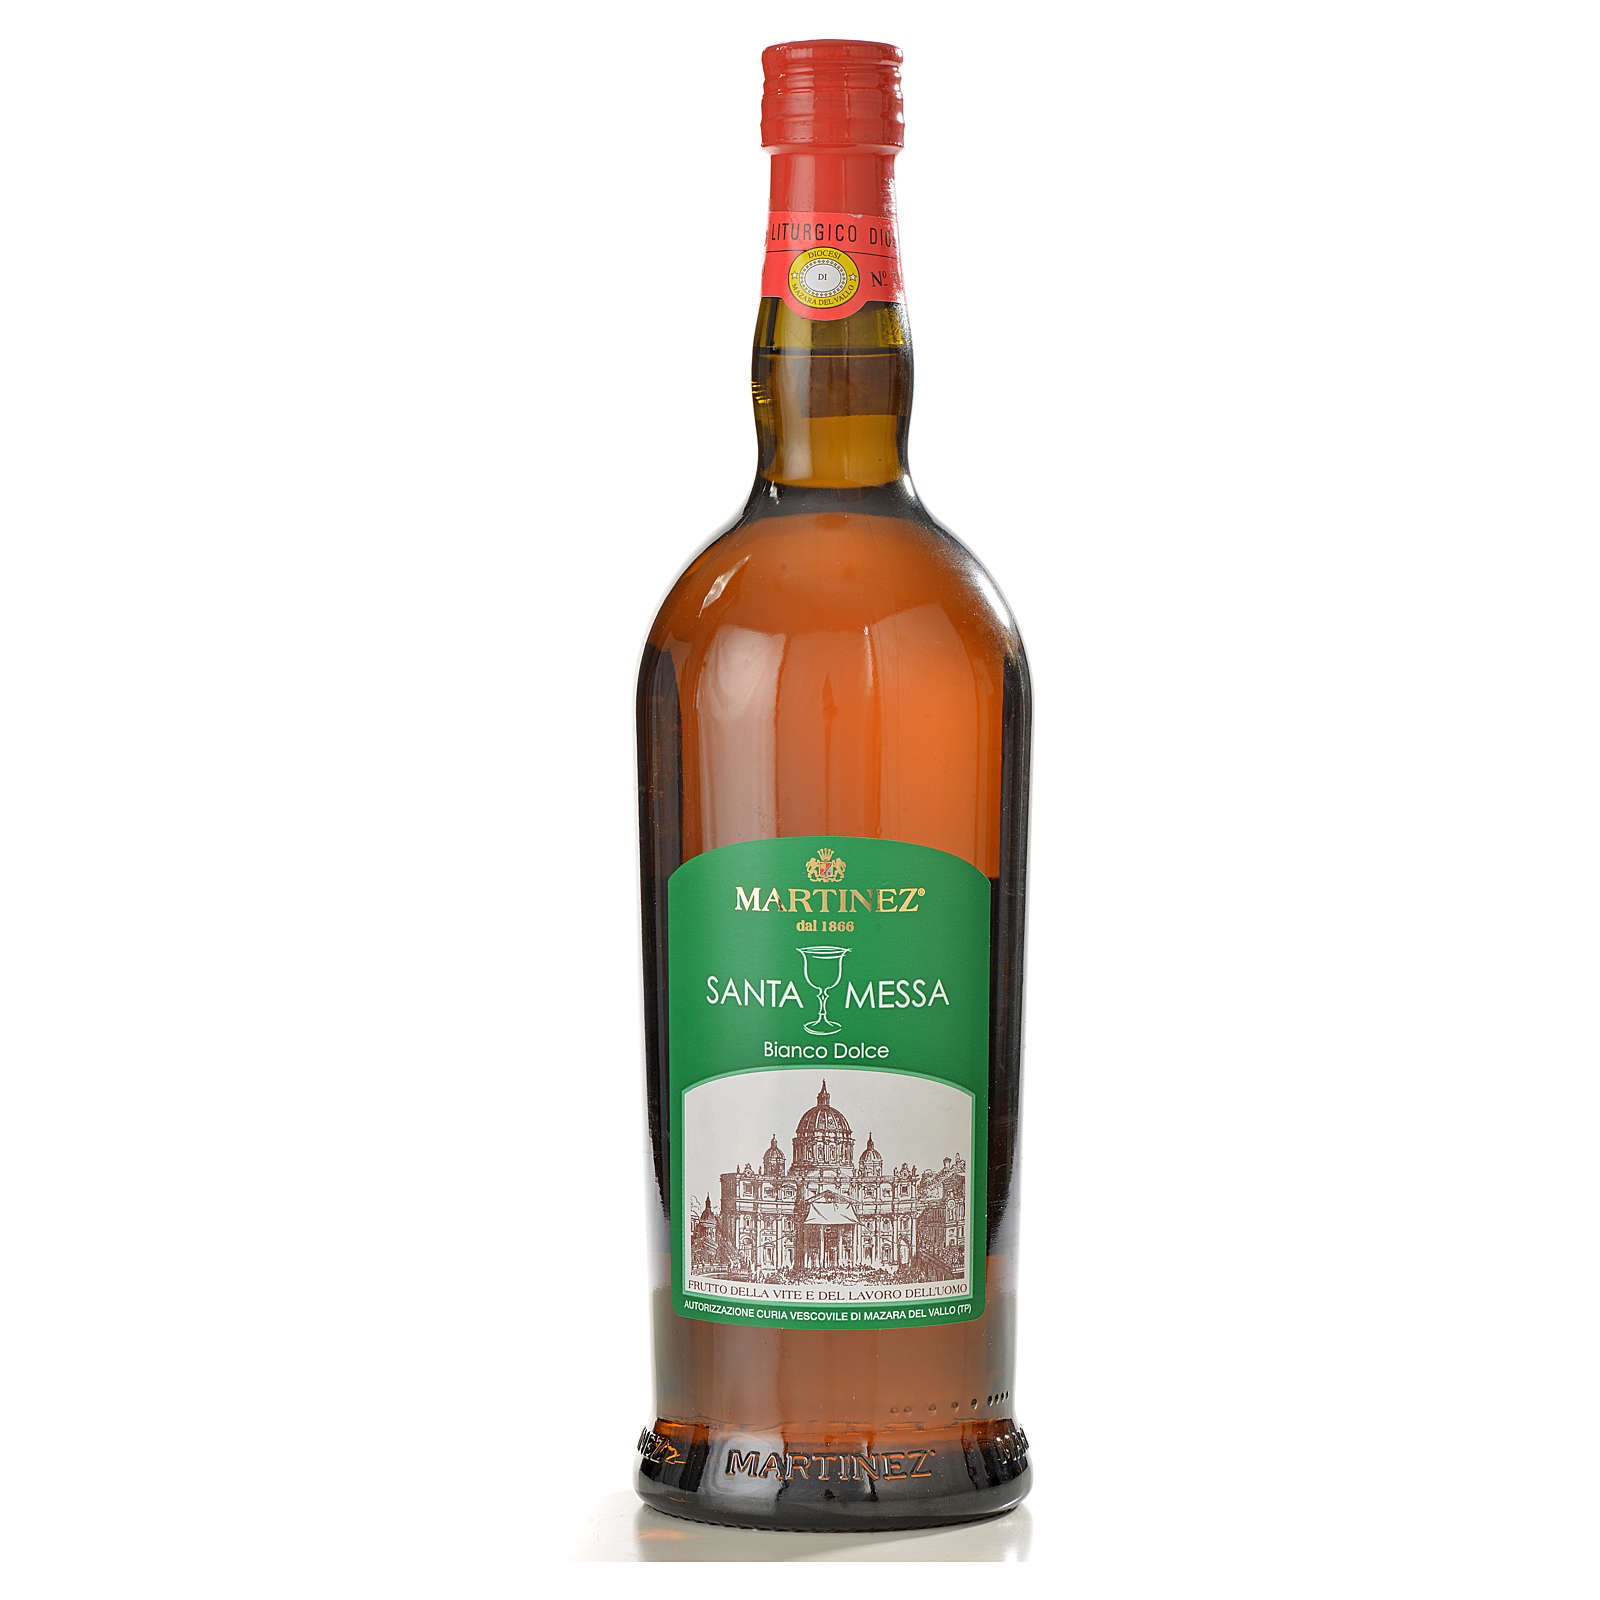 Vinho de Missa branco doce Martinez 3